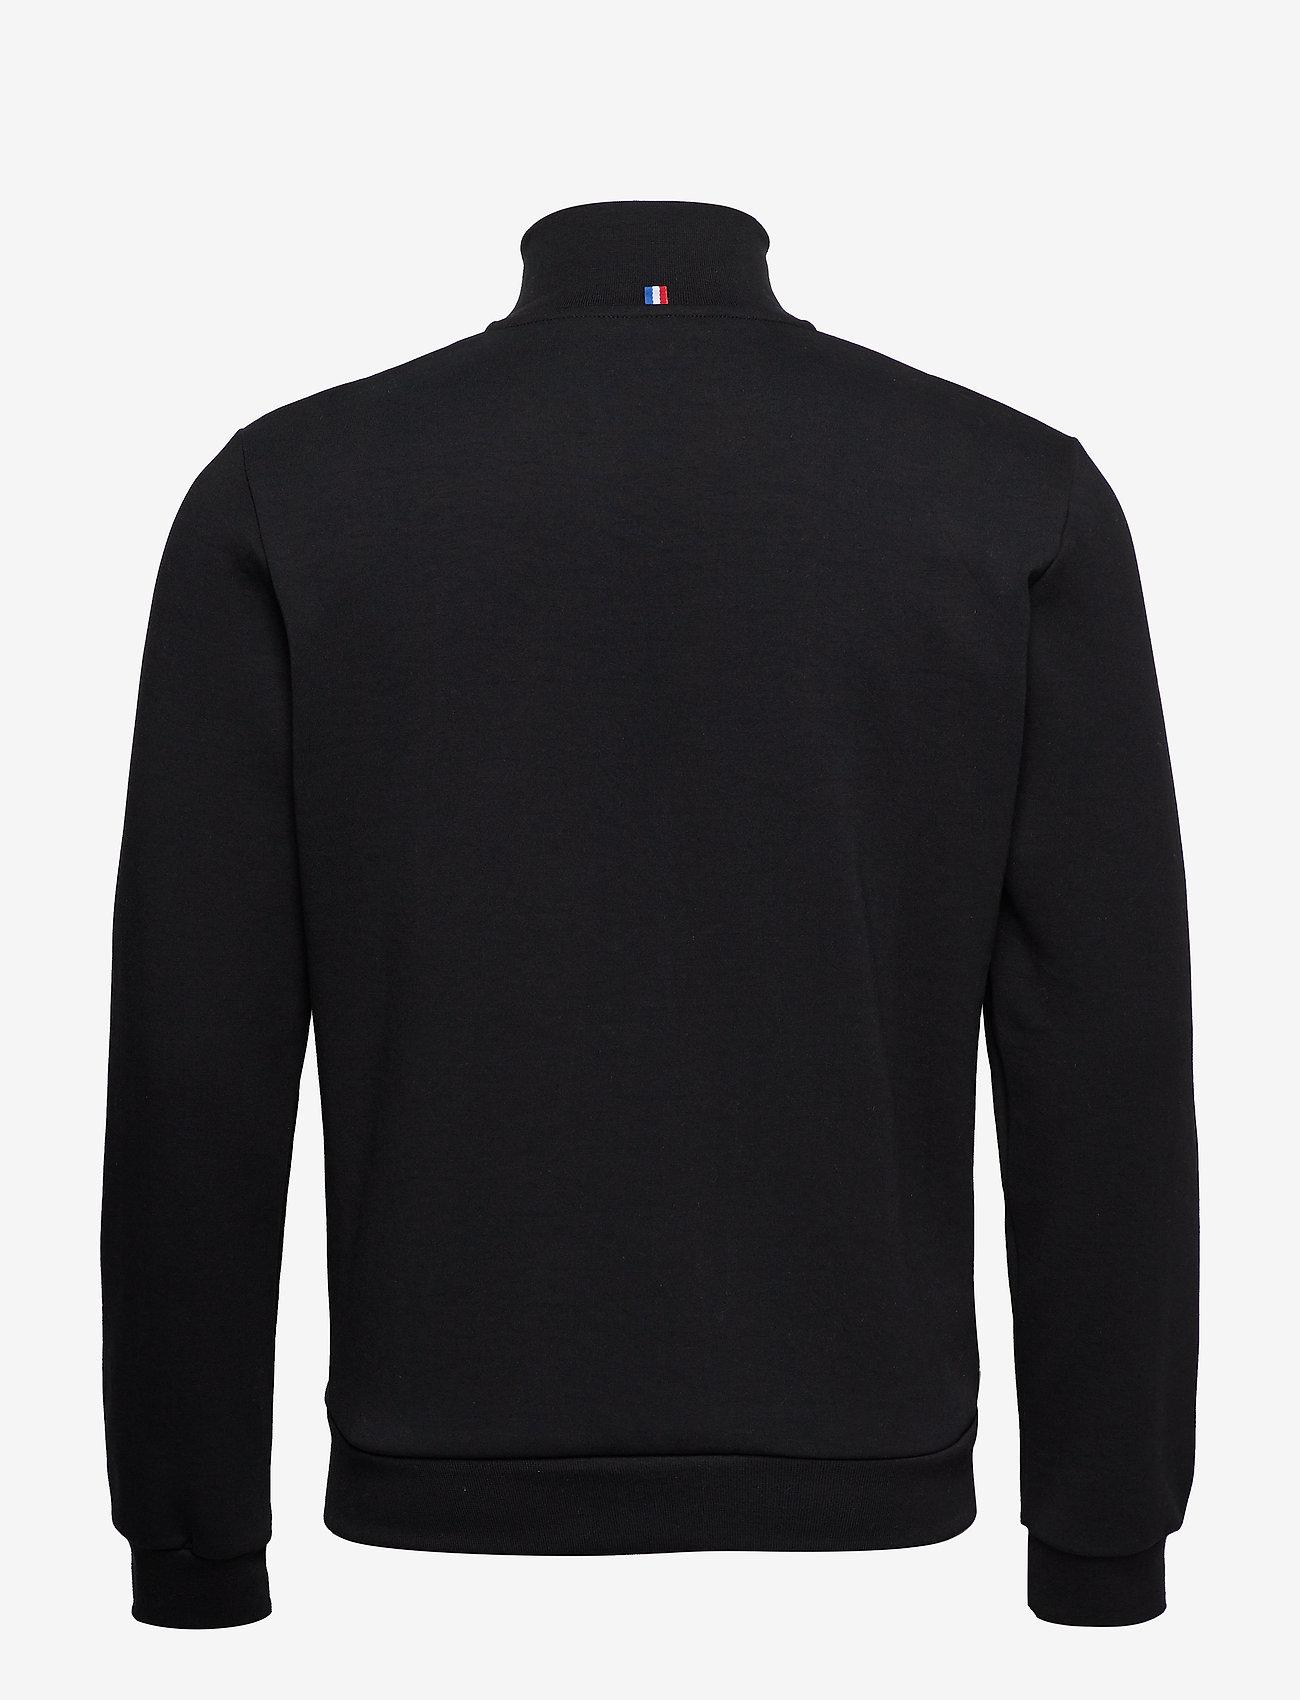 Ess Fz Sweat N°1 M (Black) (799.20 kr) - Le Coq Sportif